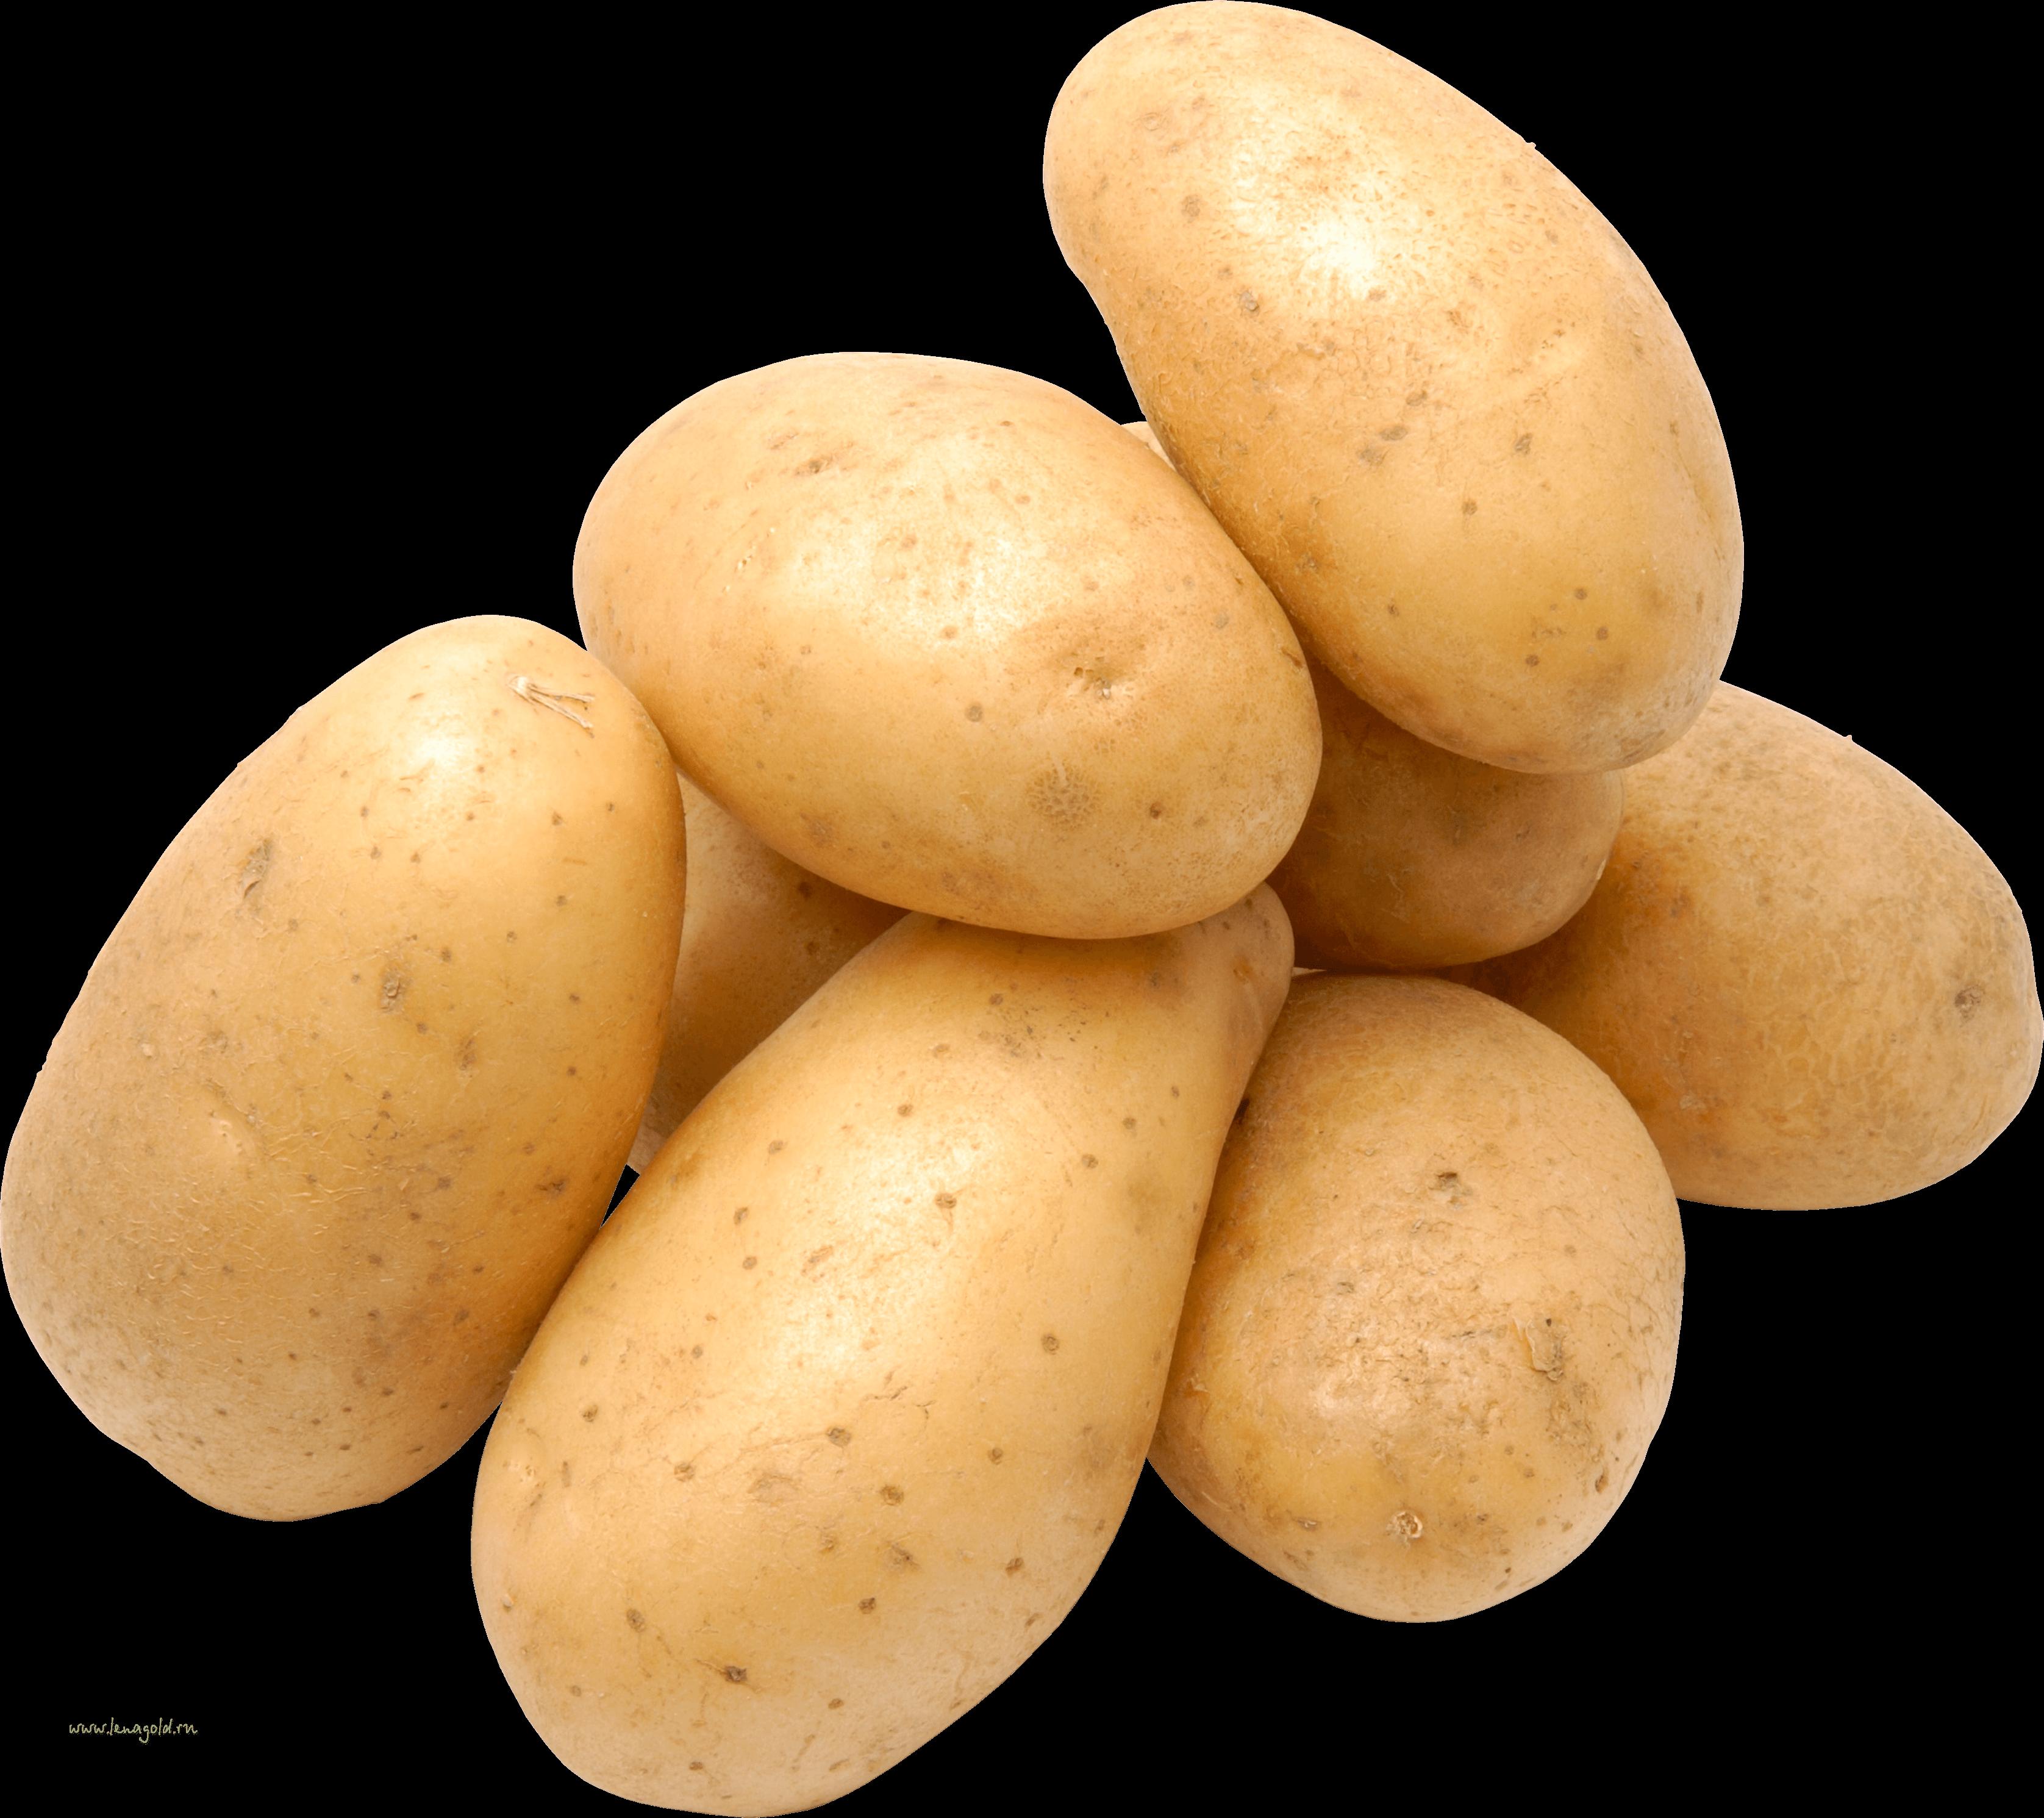 Download png images hq. Potato clipart twister